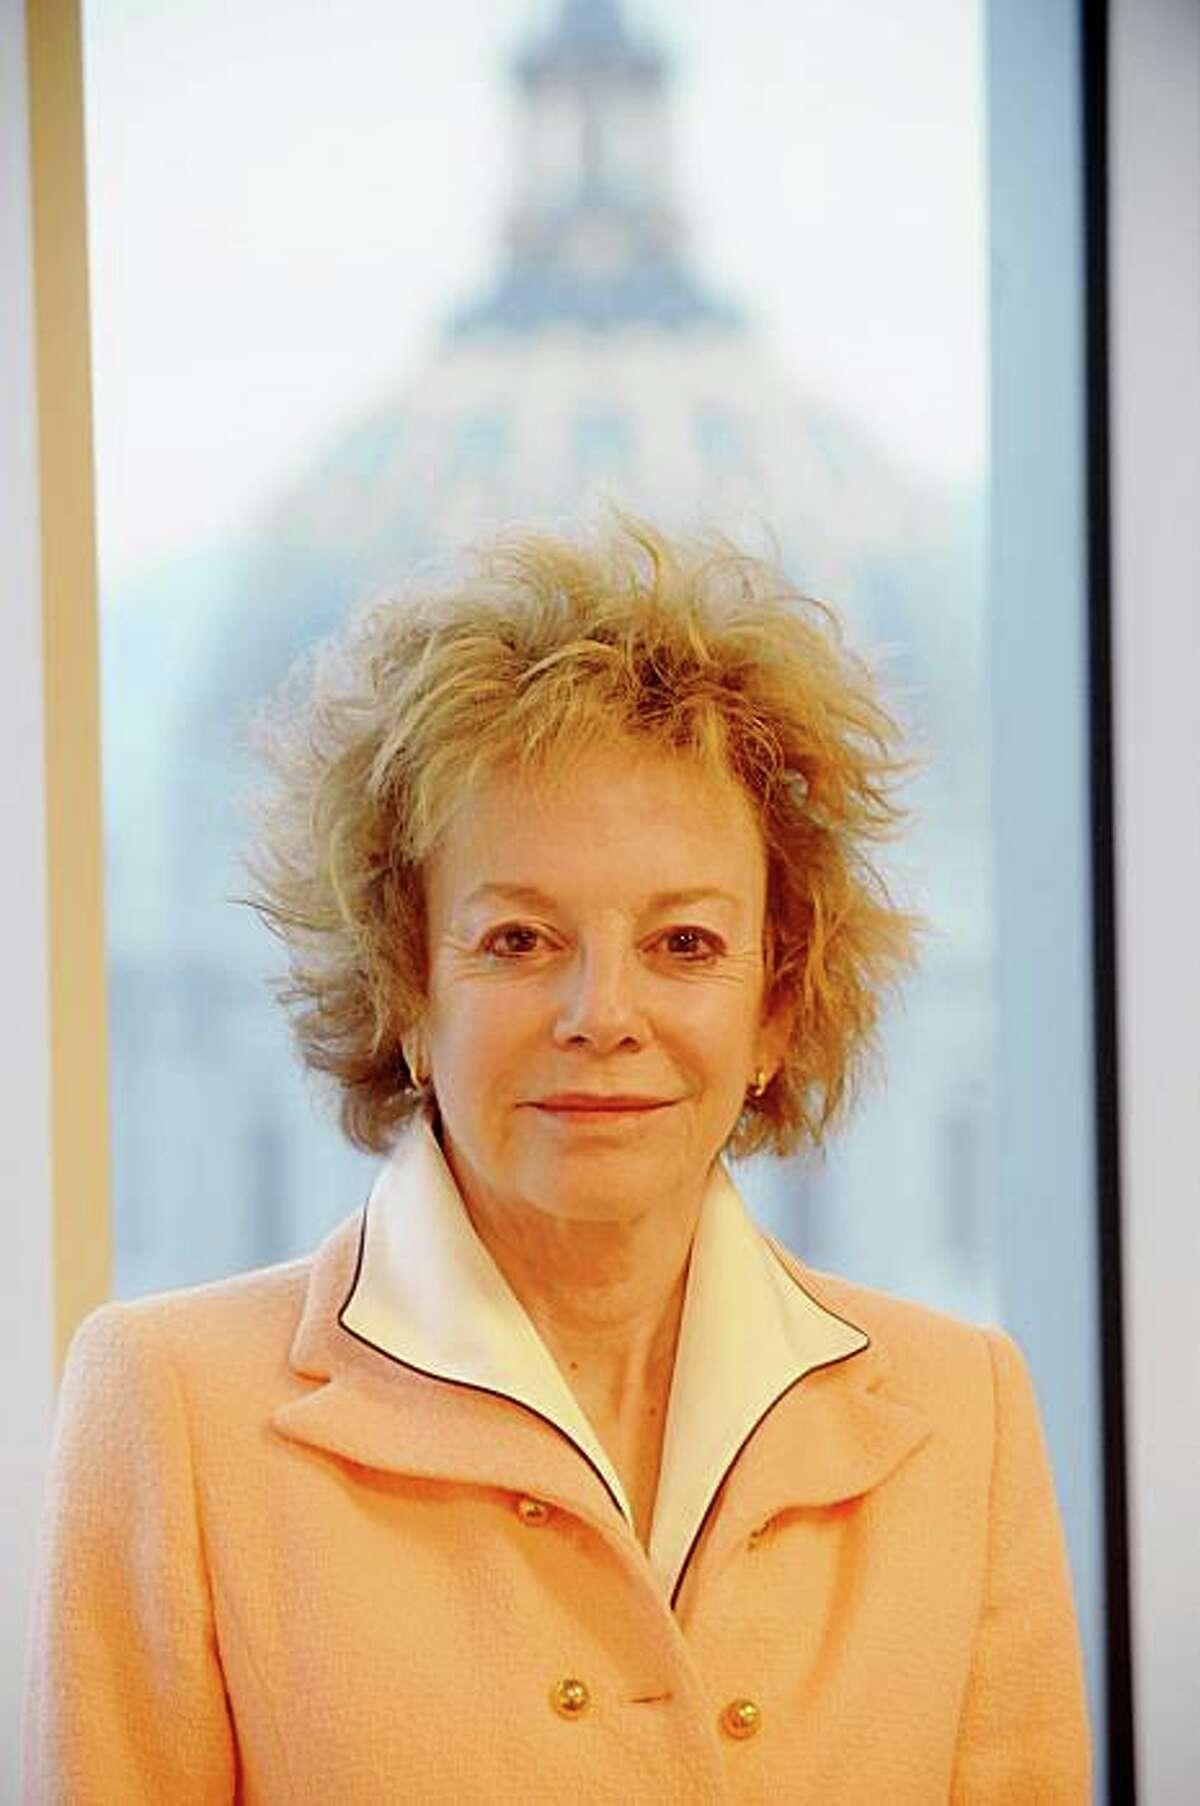 State Sen. Carole Migden, D-San Francisco, poses in her San Francisco office on Monday, Nov. 24, 2008.